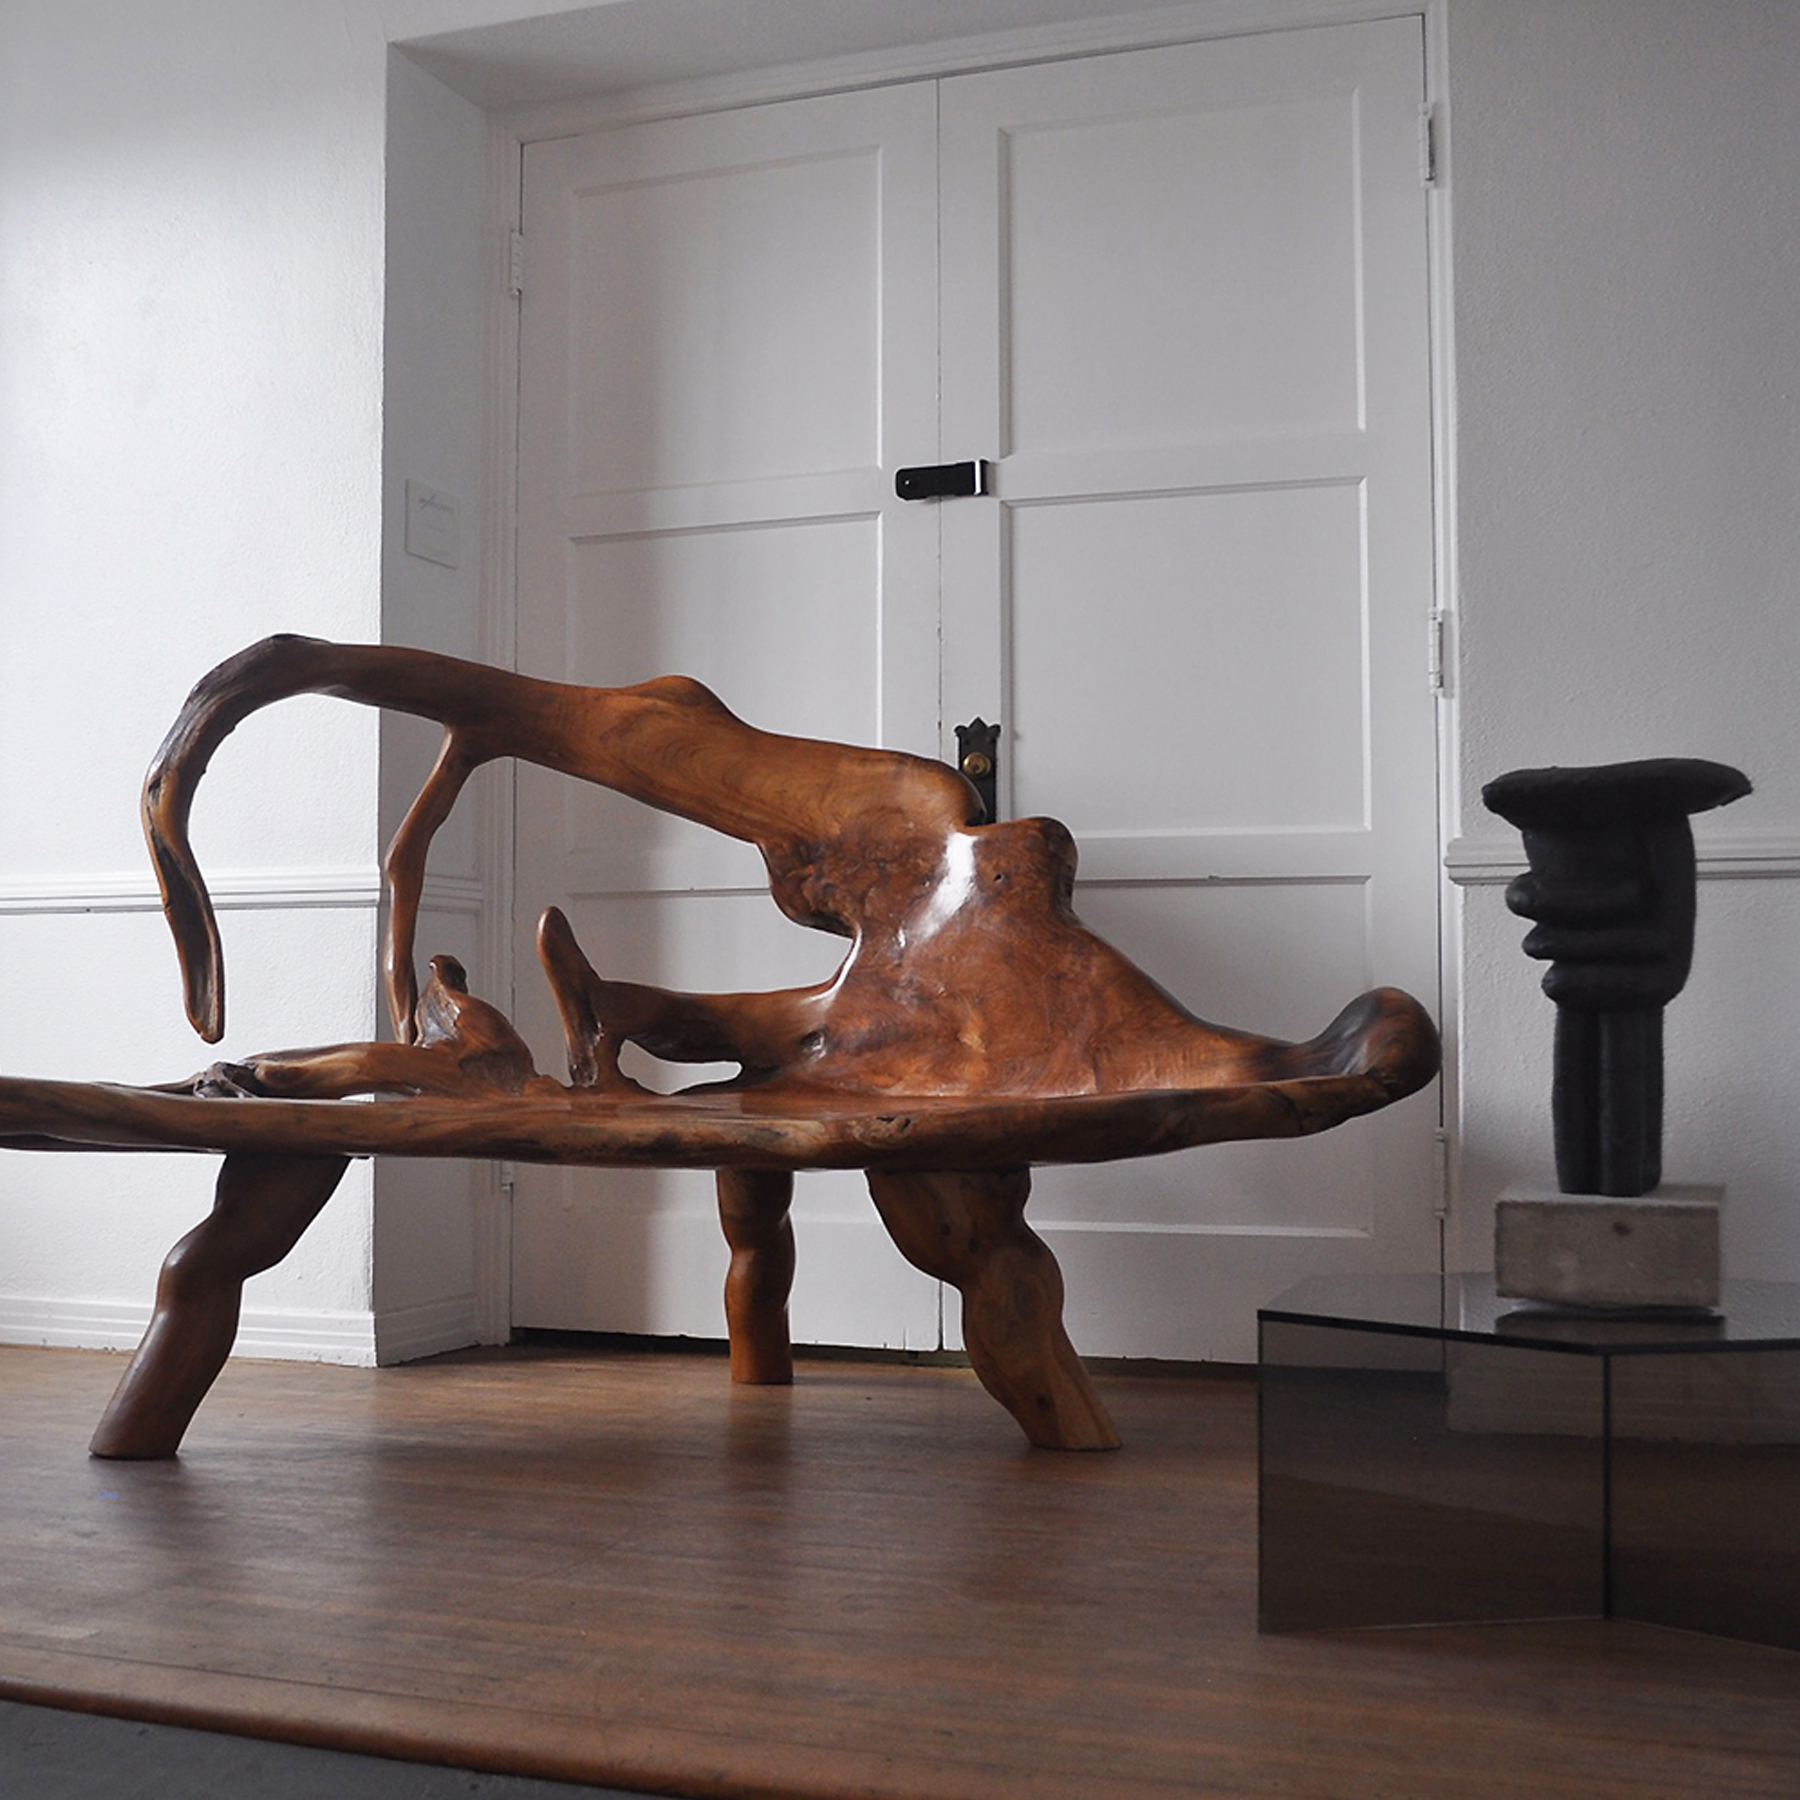 siglo-moderno-brand-history-sculpting-51.jpg